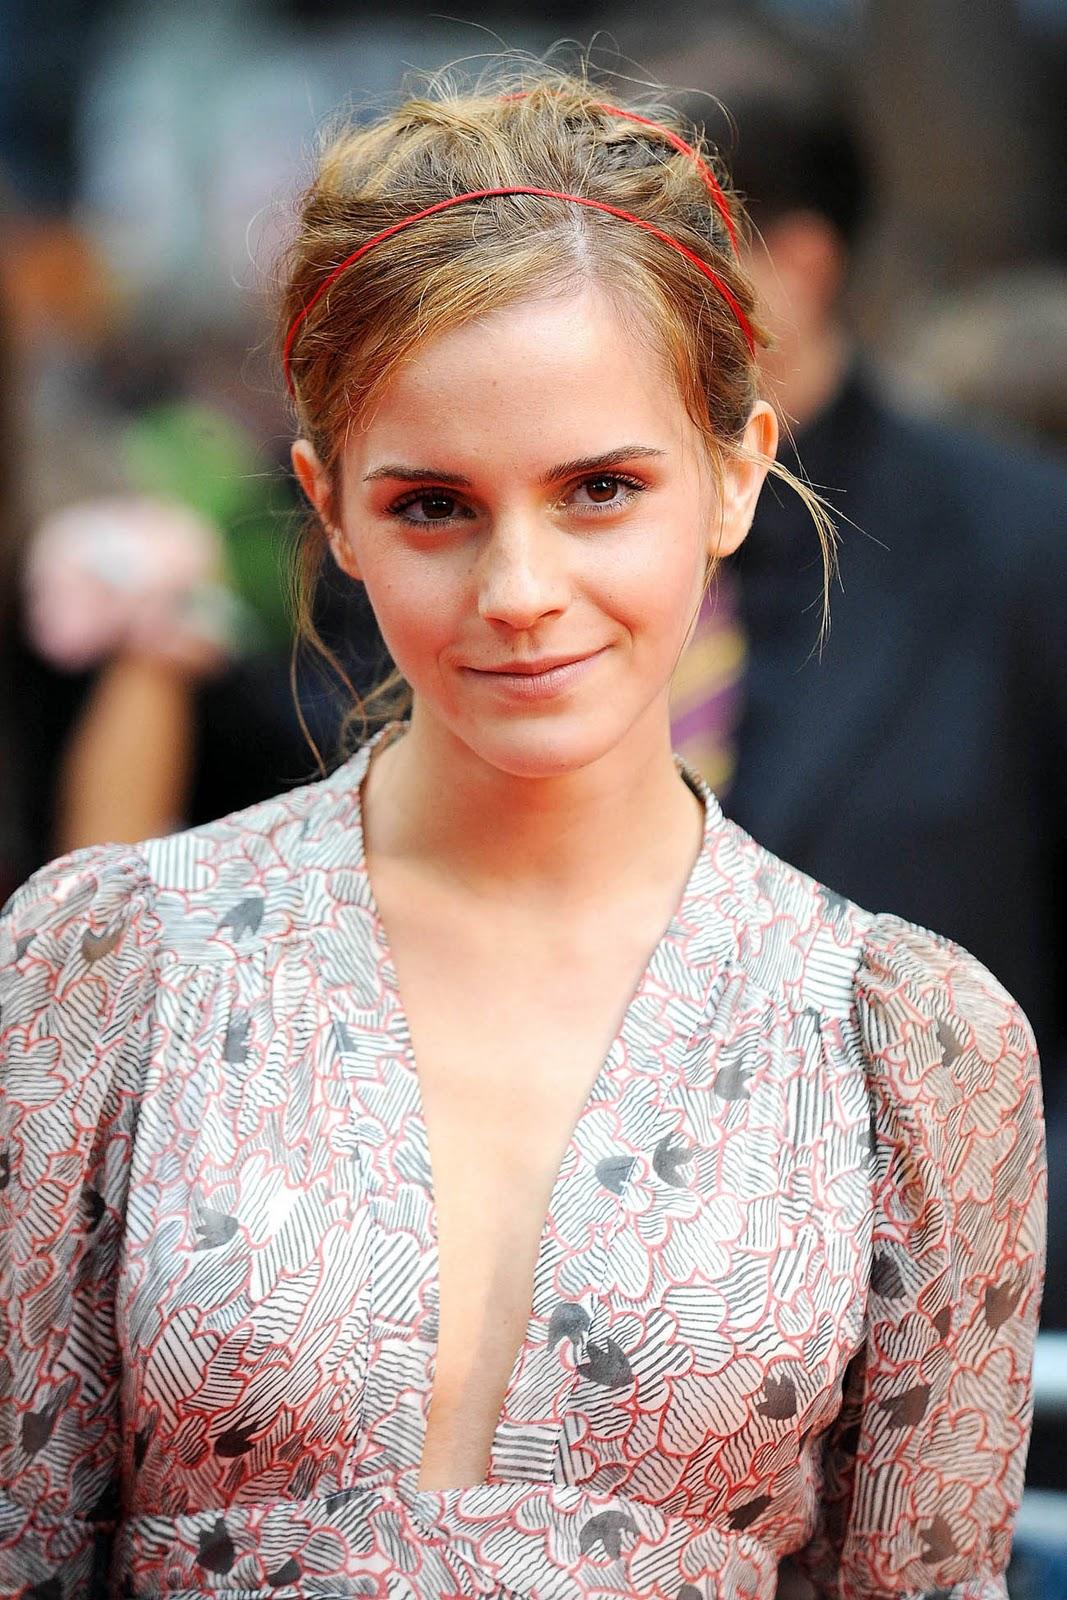 Emma Watson Hollywood Actress 40 Fantastic Photos: Collection II: Emma Watson